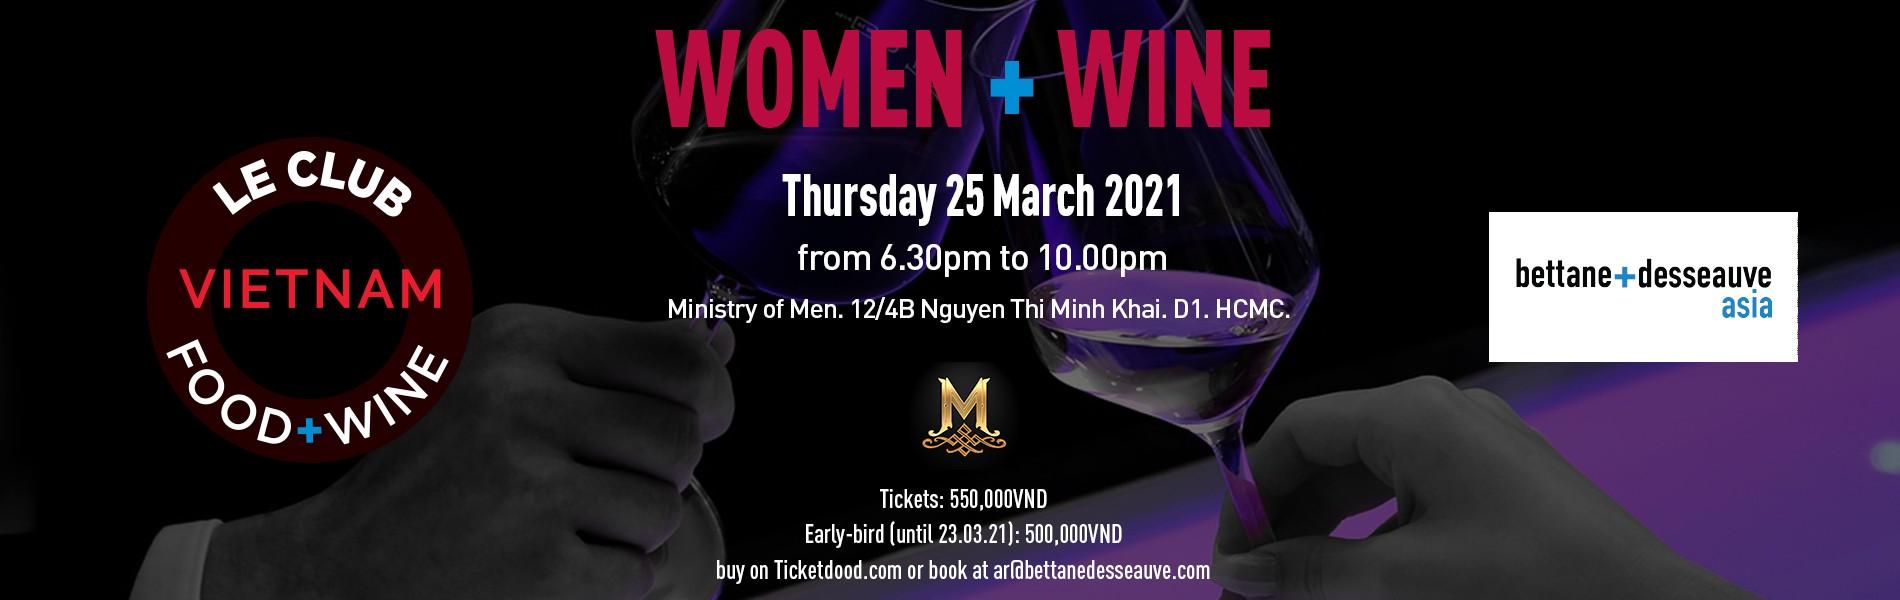 Le Club Food & WIne - Women + Wine